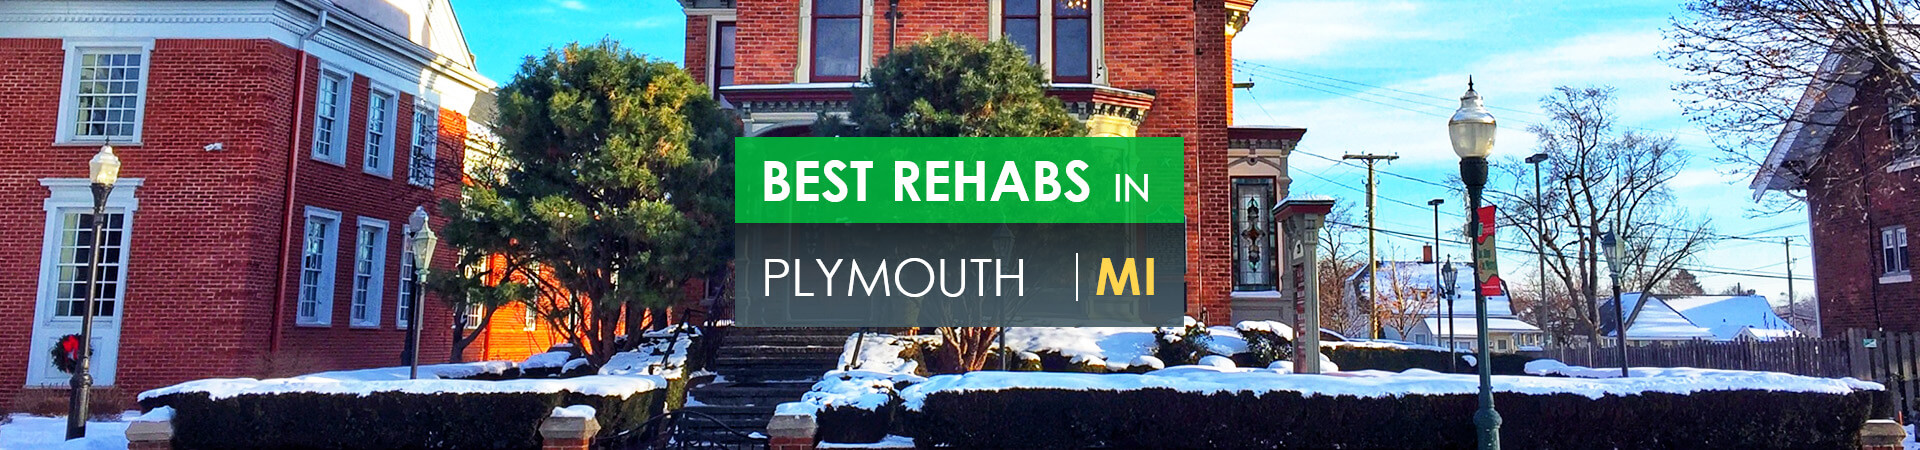 Best rehabs in Plymouth, MI